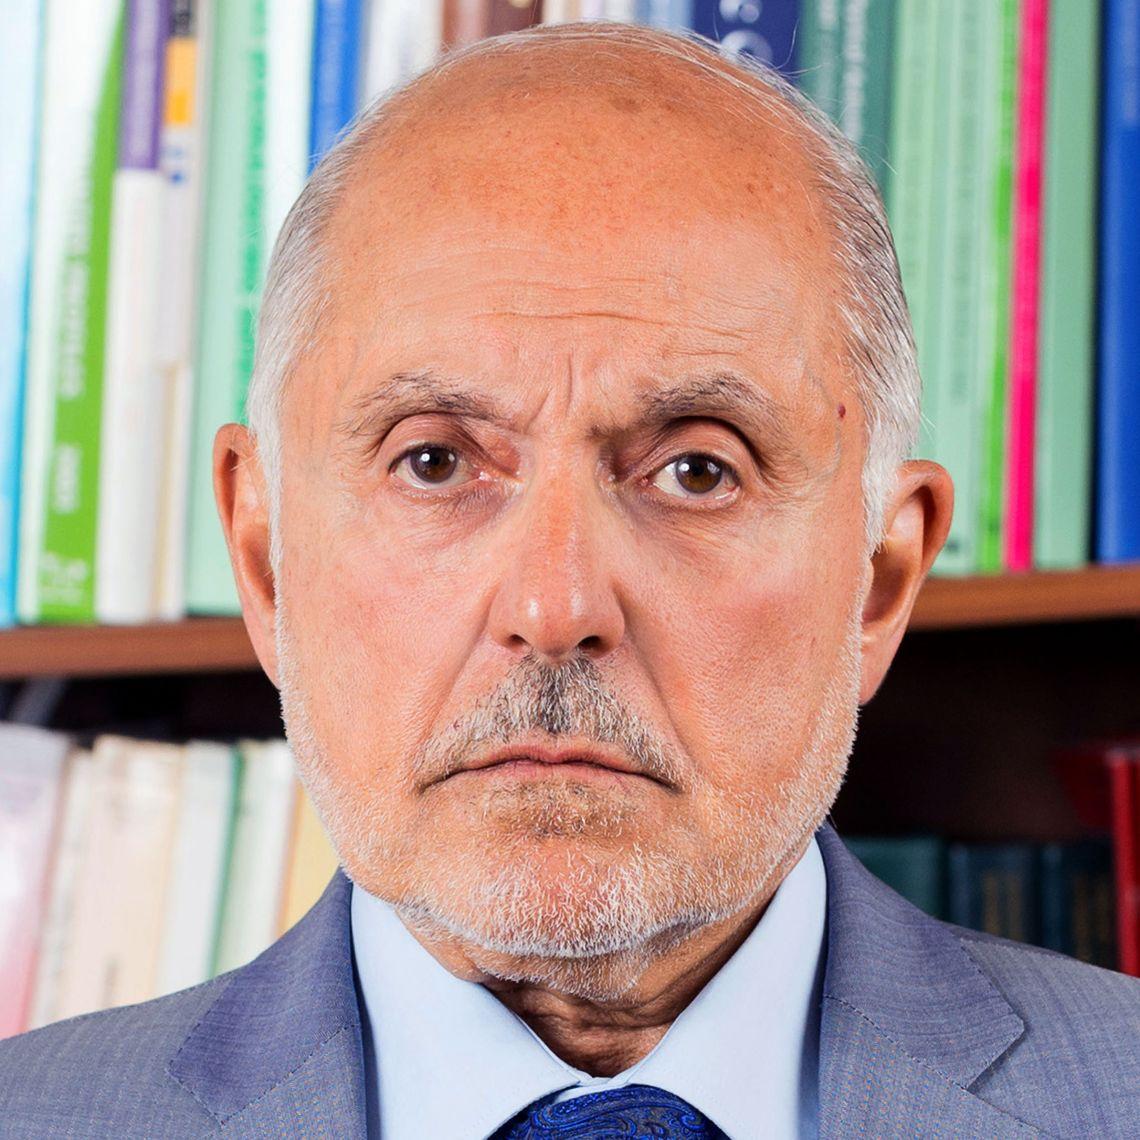 Professor David Zaridze